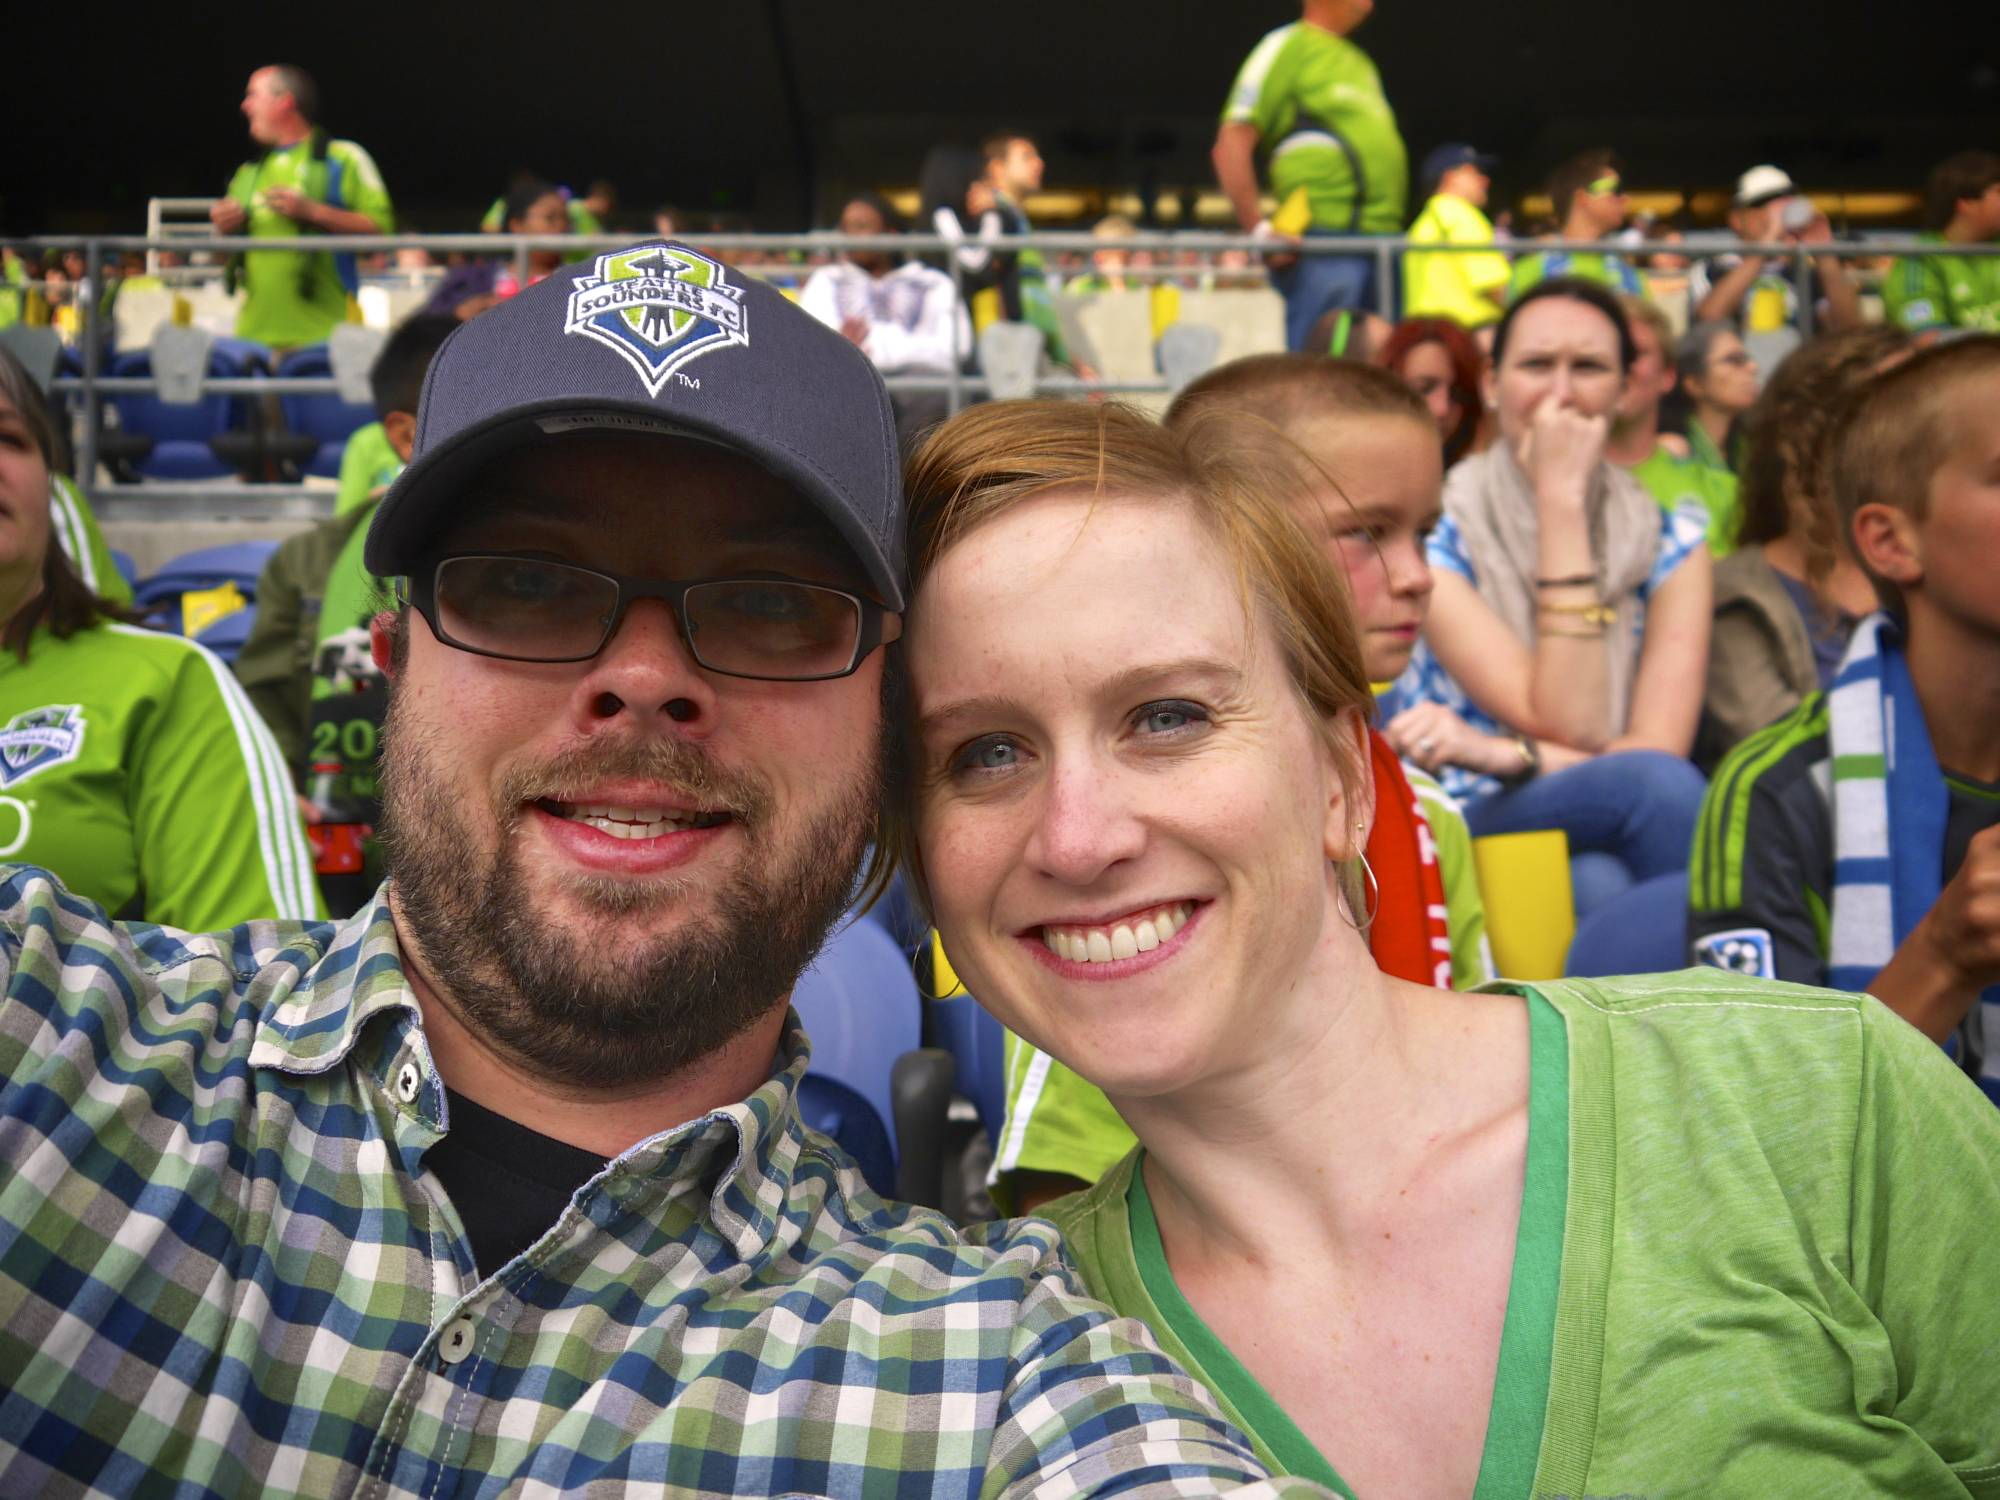 Heather & Josh - Sounder's Newest Fans